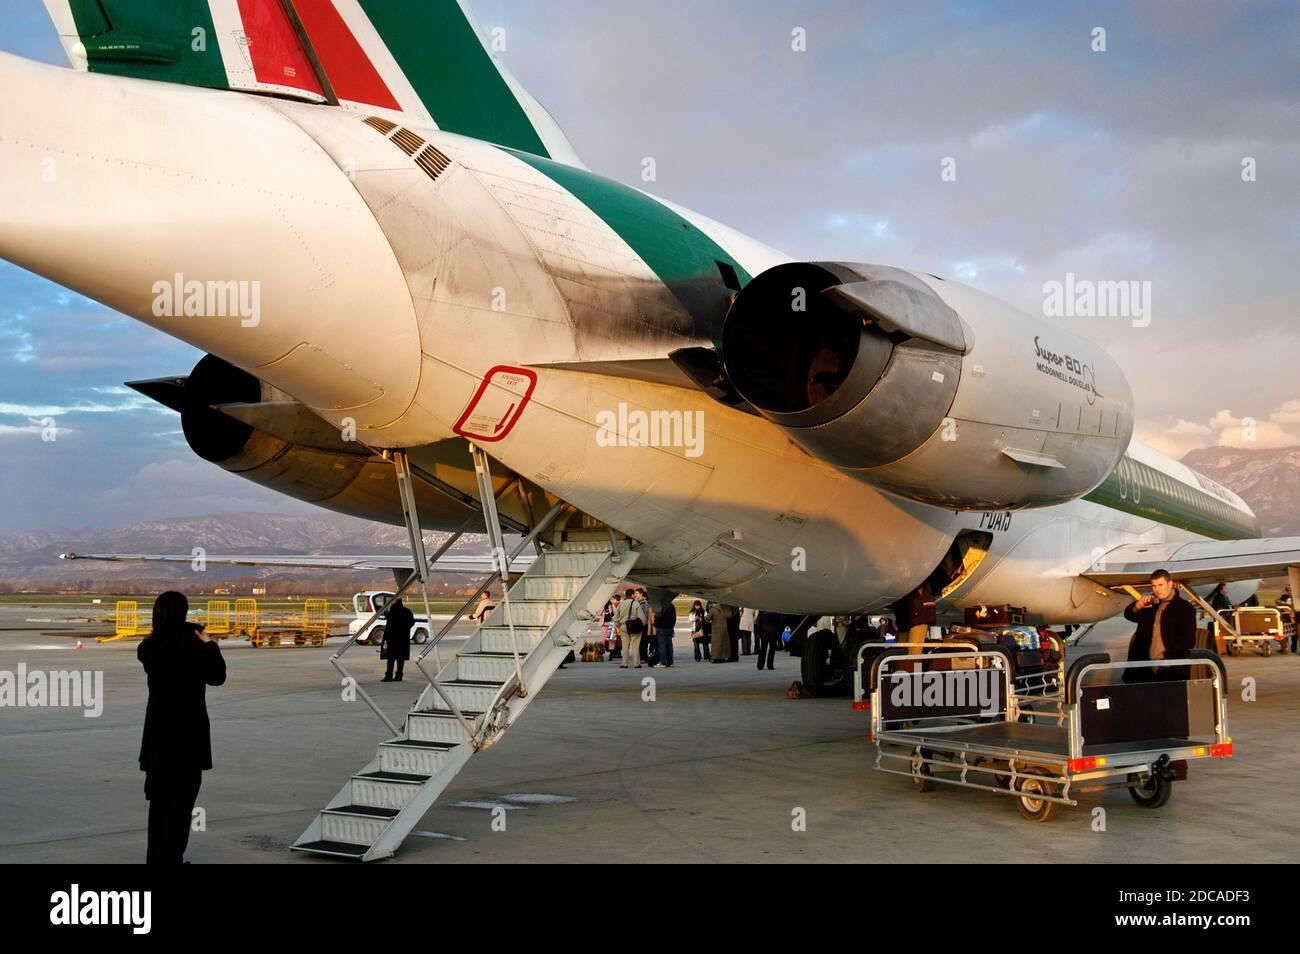 Alitalia flight unloading at Mother Theresa airport, Tirana, Albania Stock Photo